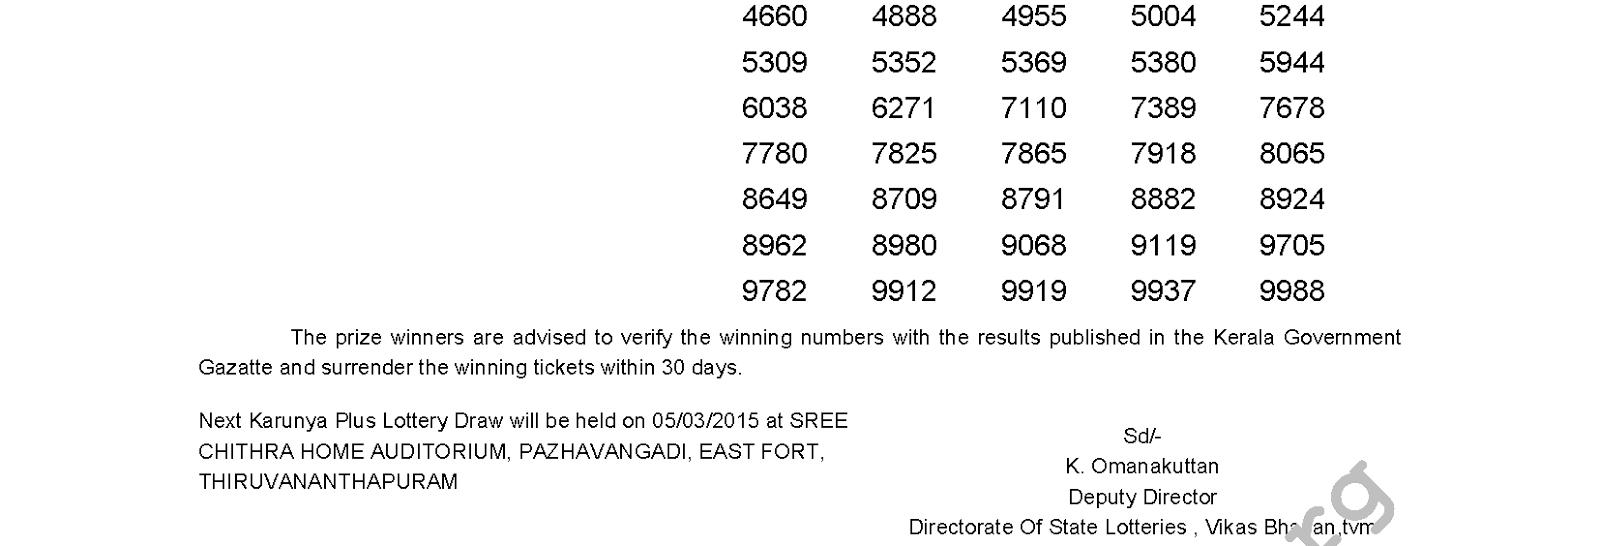 Karunya Plus Lottery KN 46 Result 26-2-2015